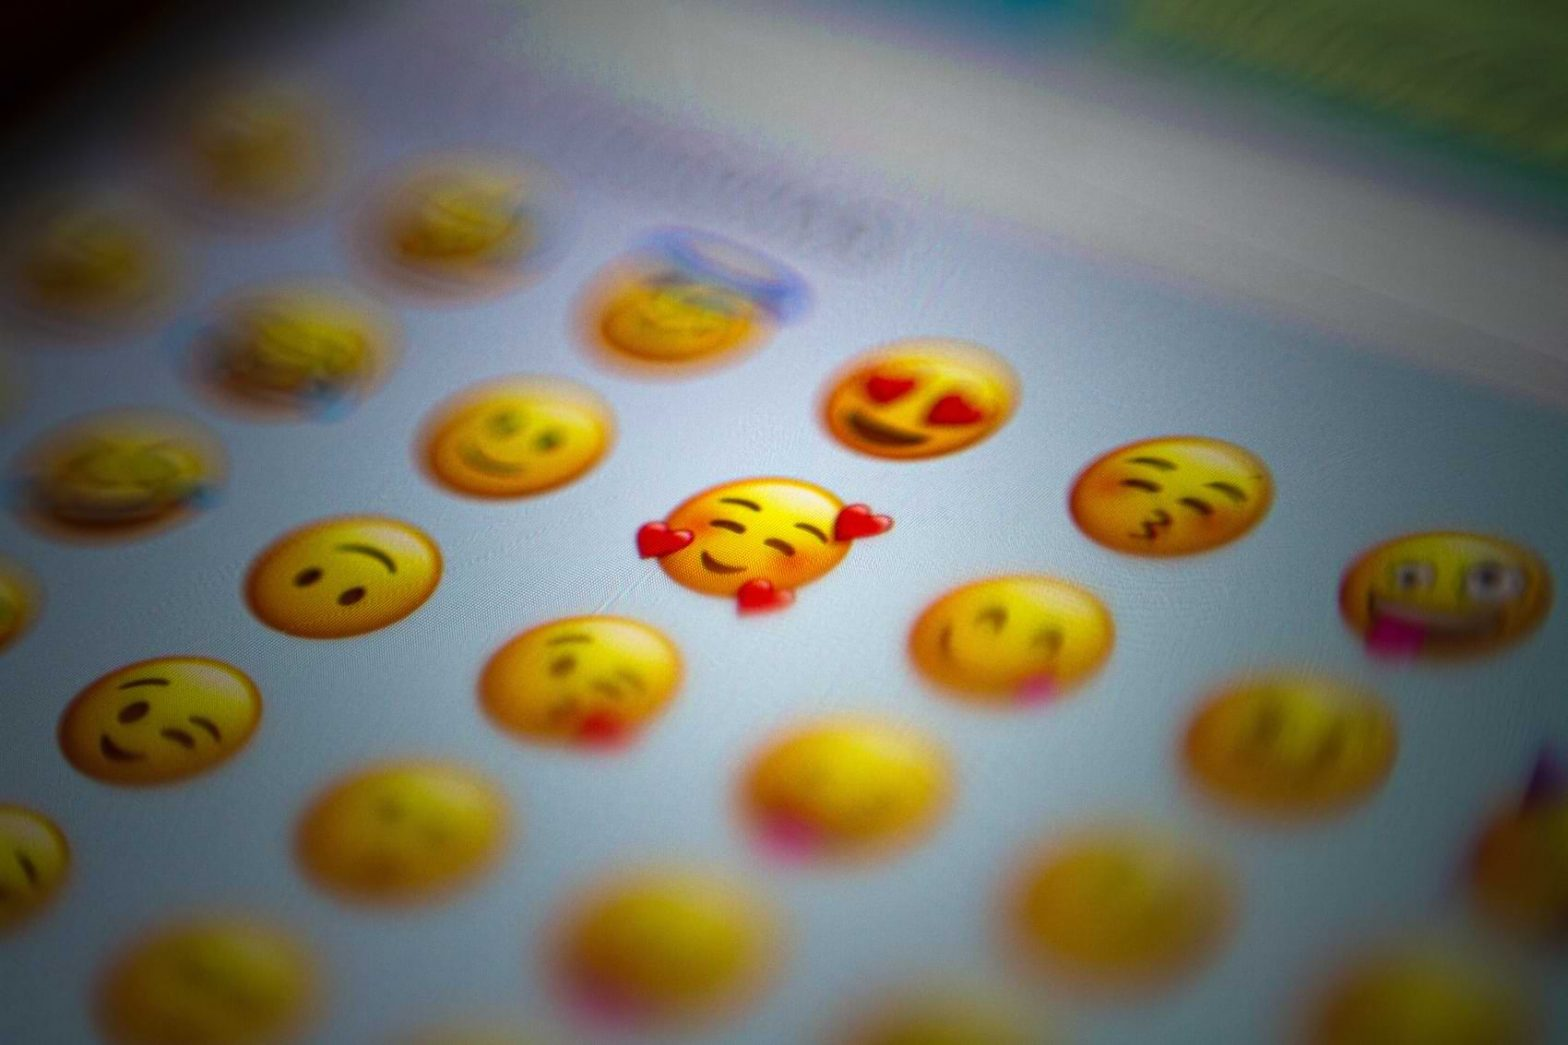 A closeup shot of a phone screen shows a handful of smiling Yellow Emojis